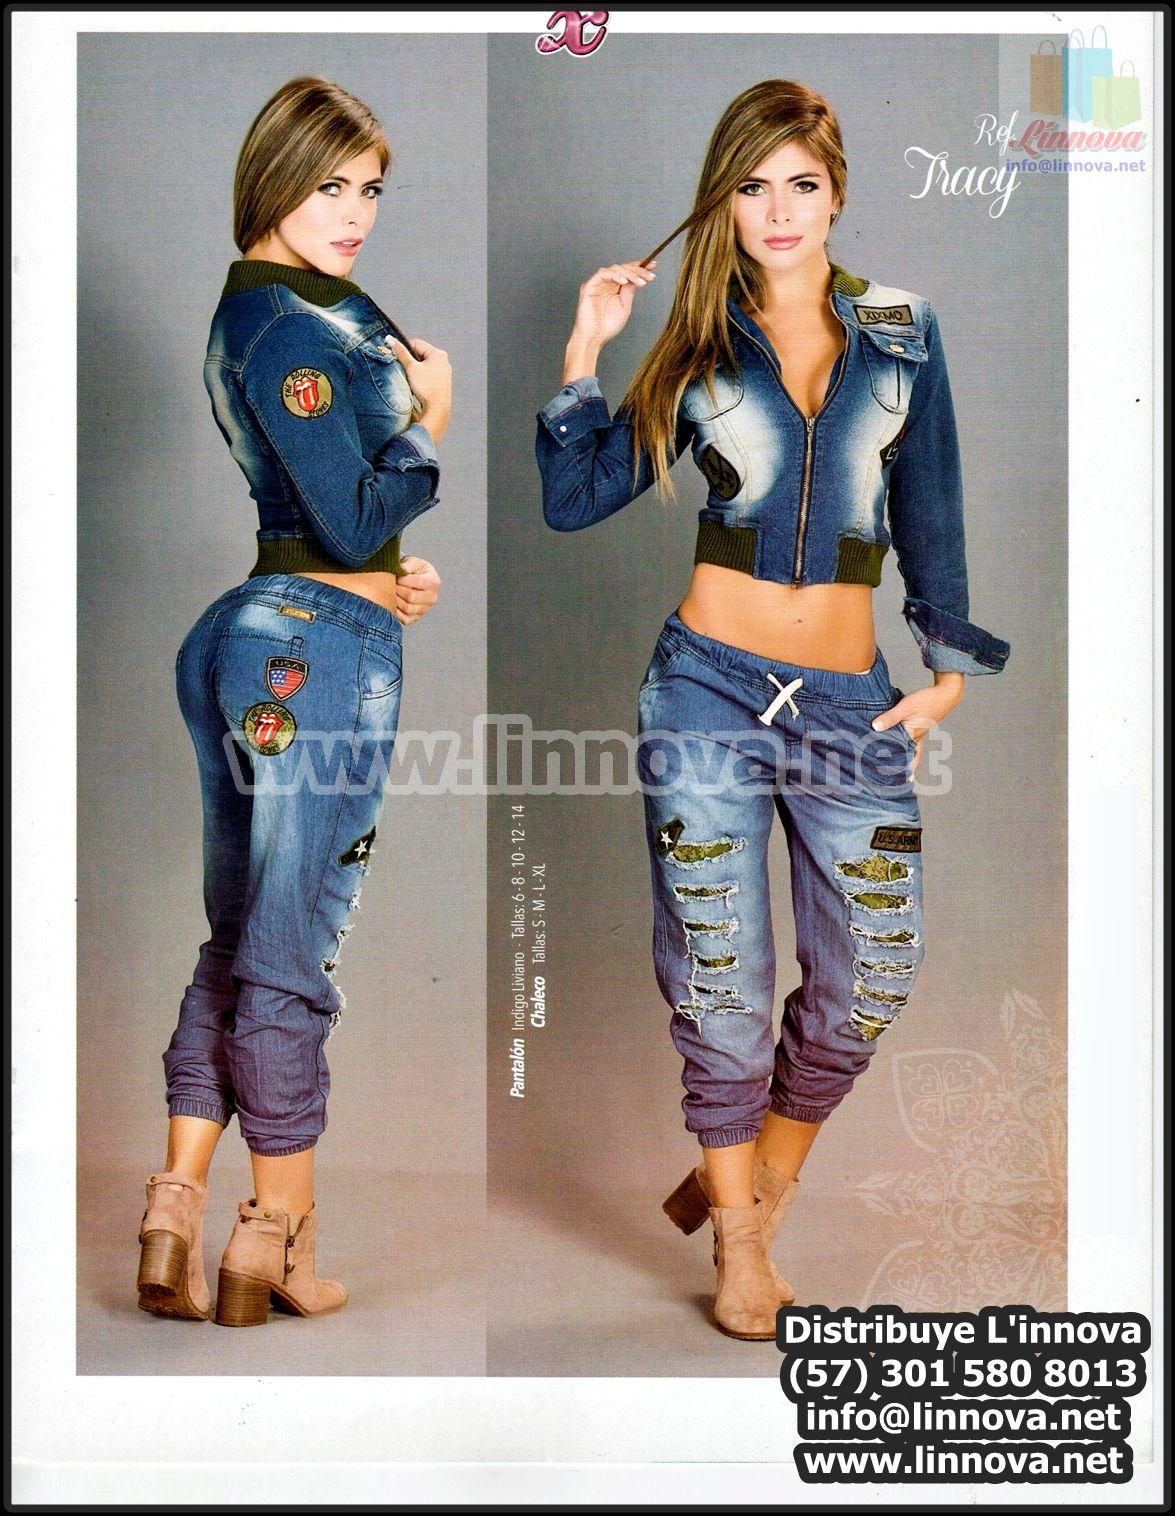 c49379e74 150519 - Catalogos de Ropa Colombia   Jeans